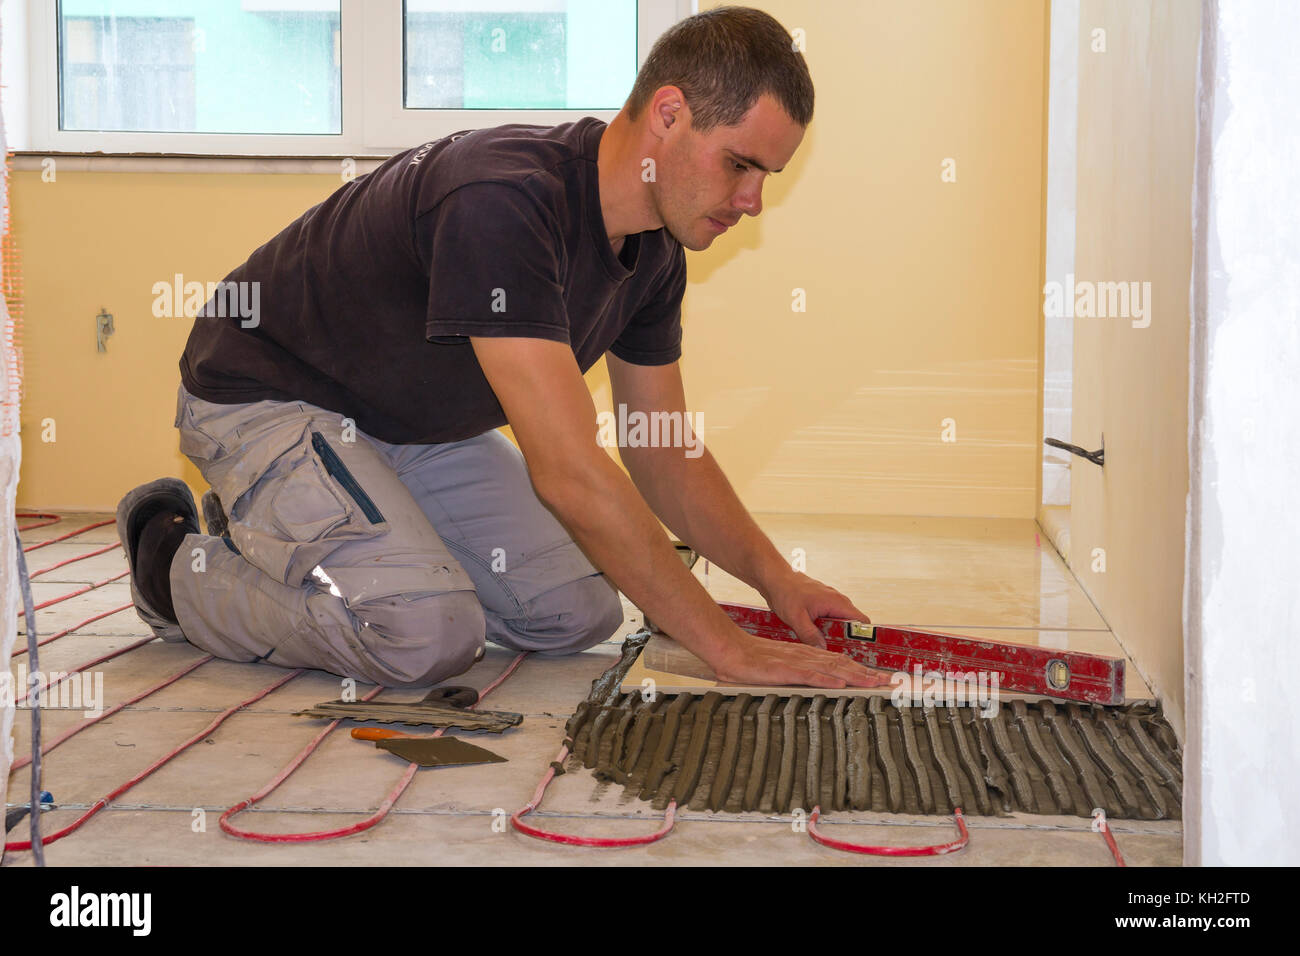 Worker installing floor tiles ceramic tiles and tools for tiler worker installing floor tiles ceramic tiles and tools for tiler home improvement renovation ceramic tile floor adhesive mortar level dailygadgetfo Image collections